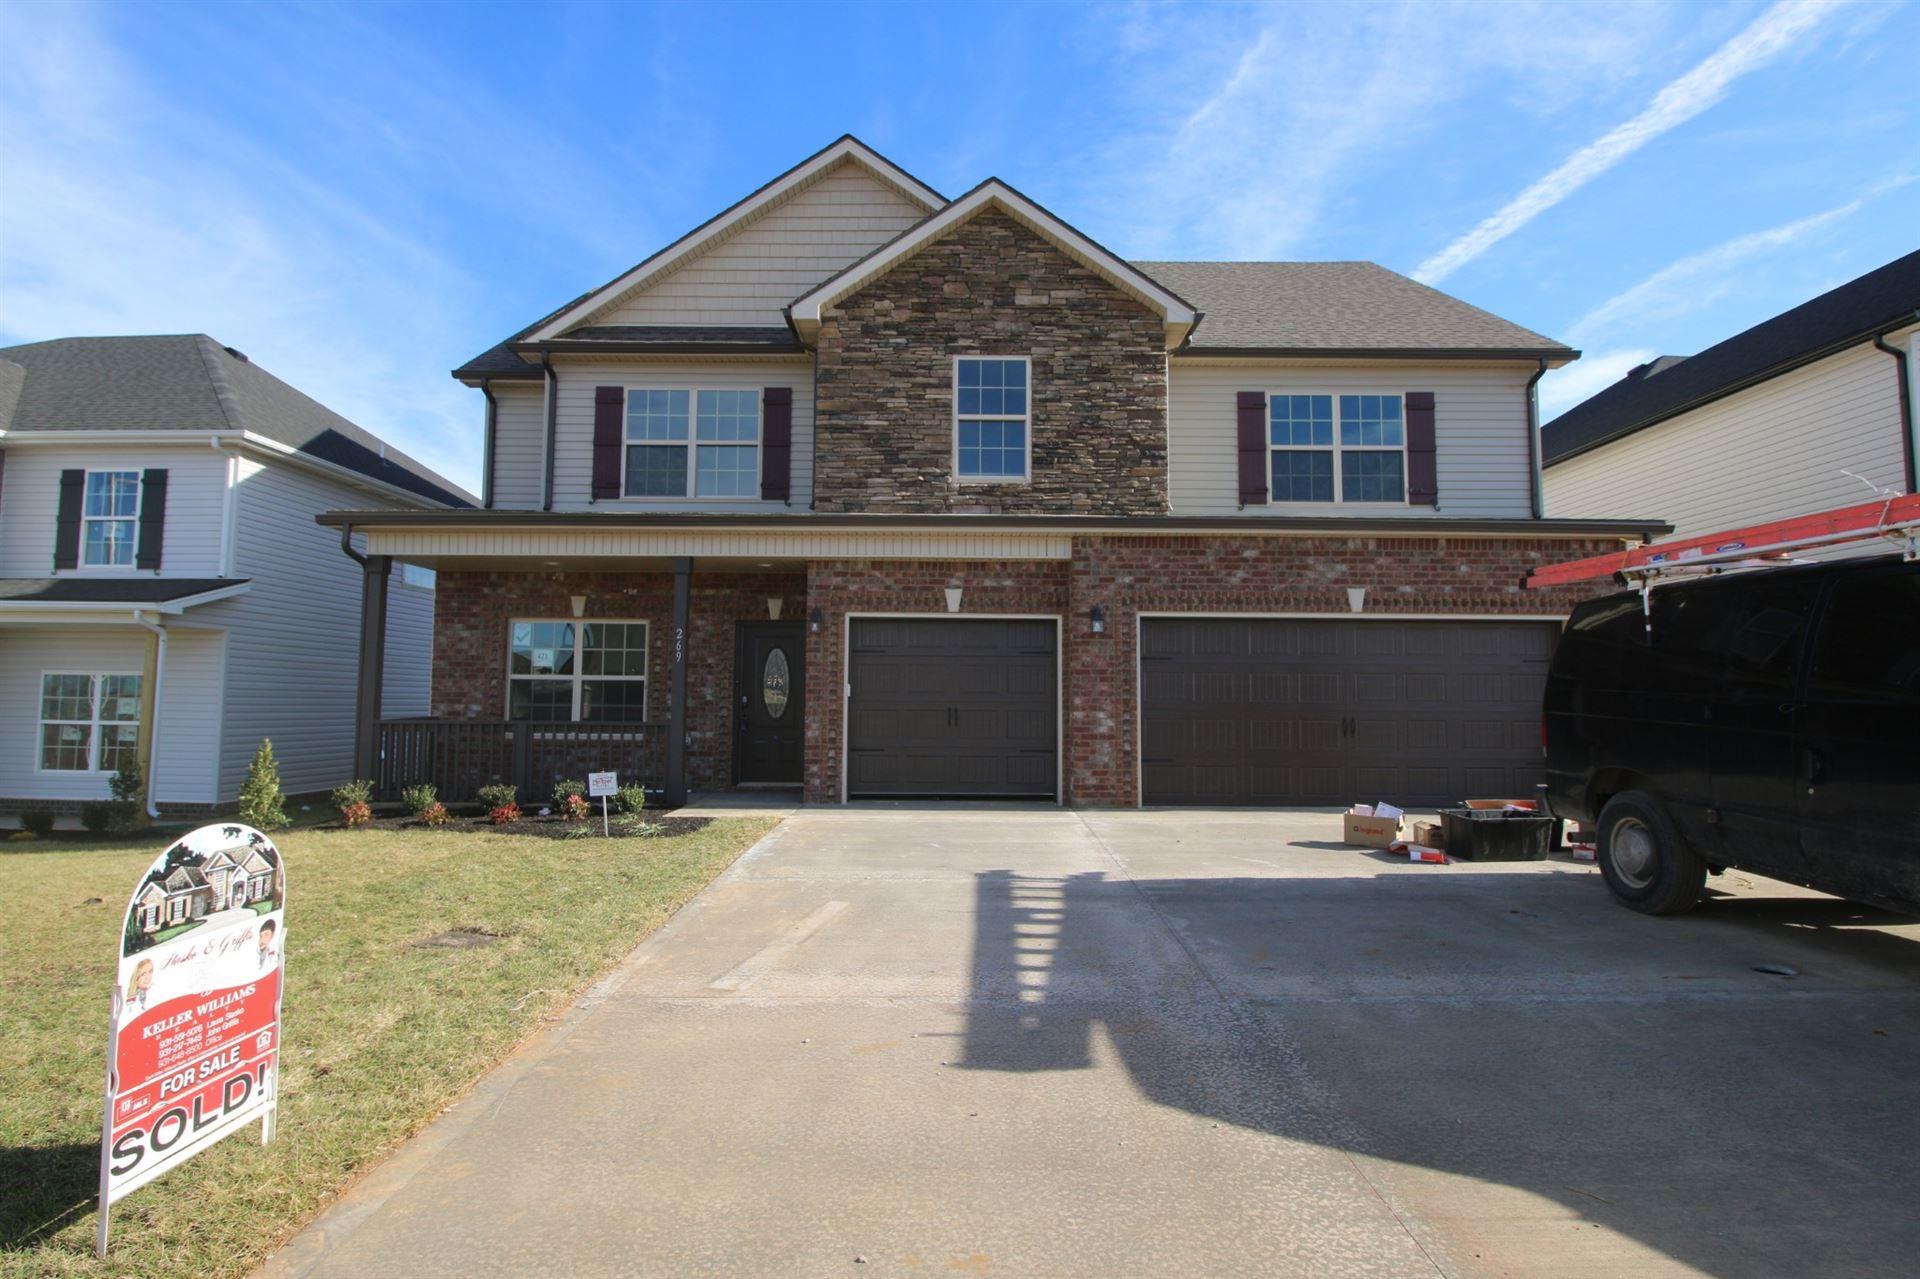 171 Mills Creek, Clarksville, TN 37042 - MLS#: 2296989